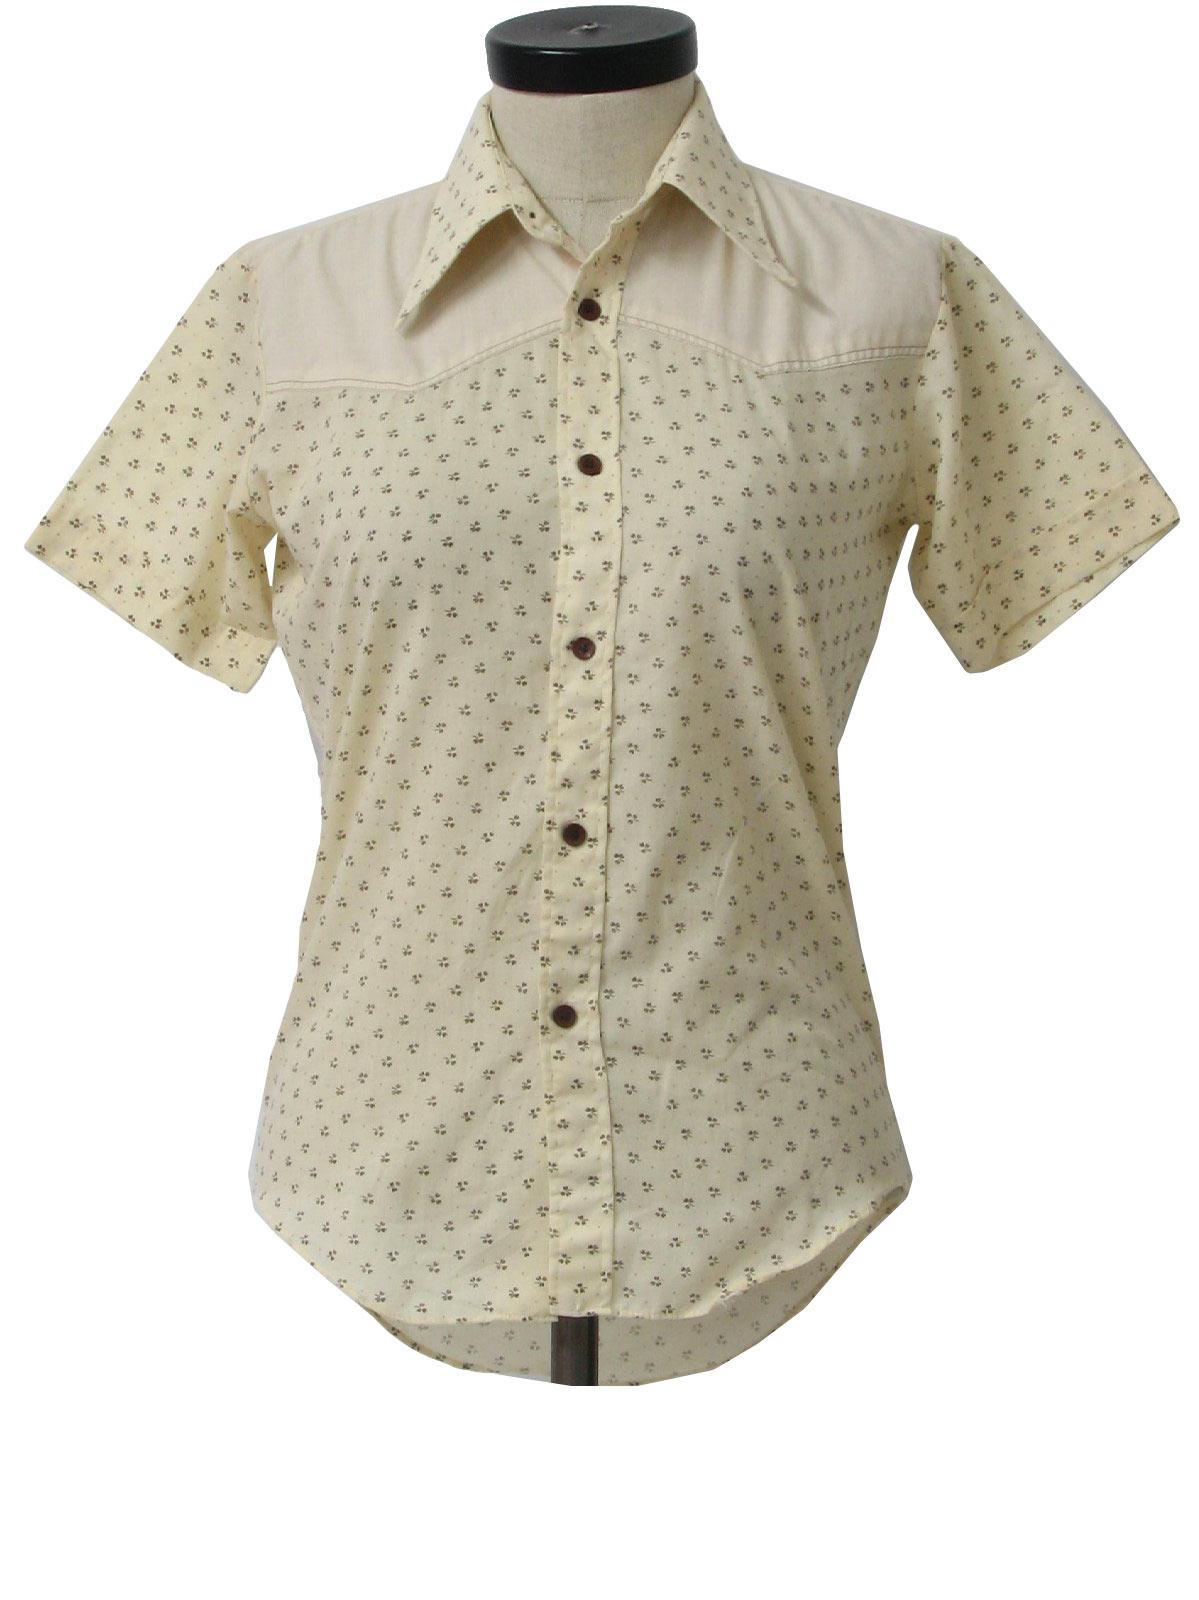 1970 39 s vintage kmart western shirt 70s kmart womens off for Kmart button up shirts